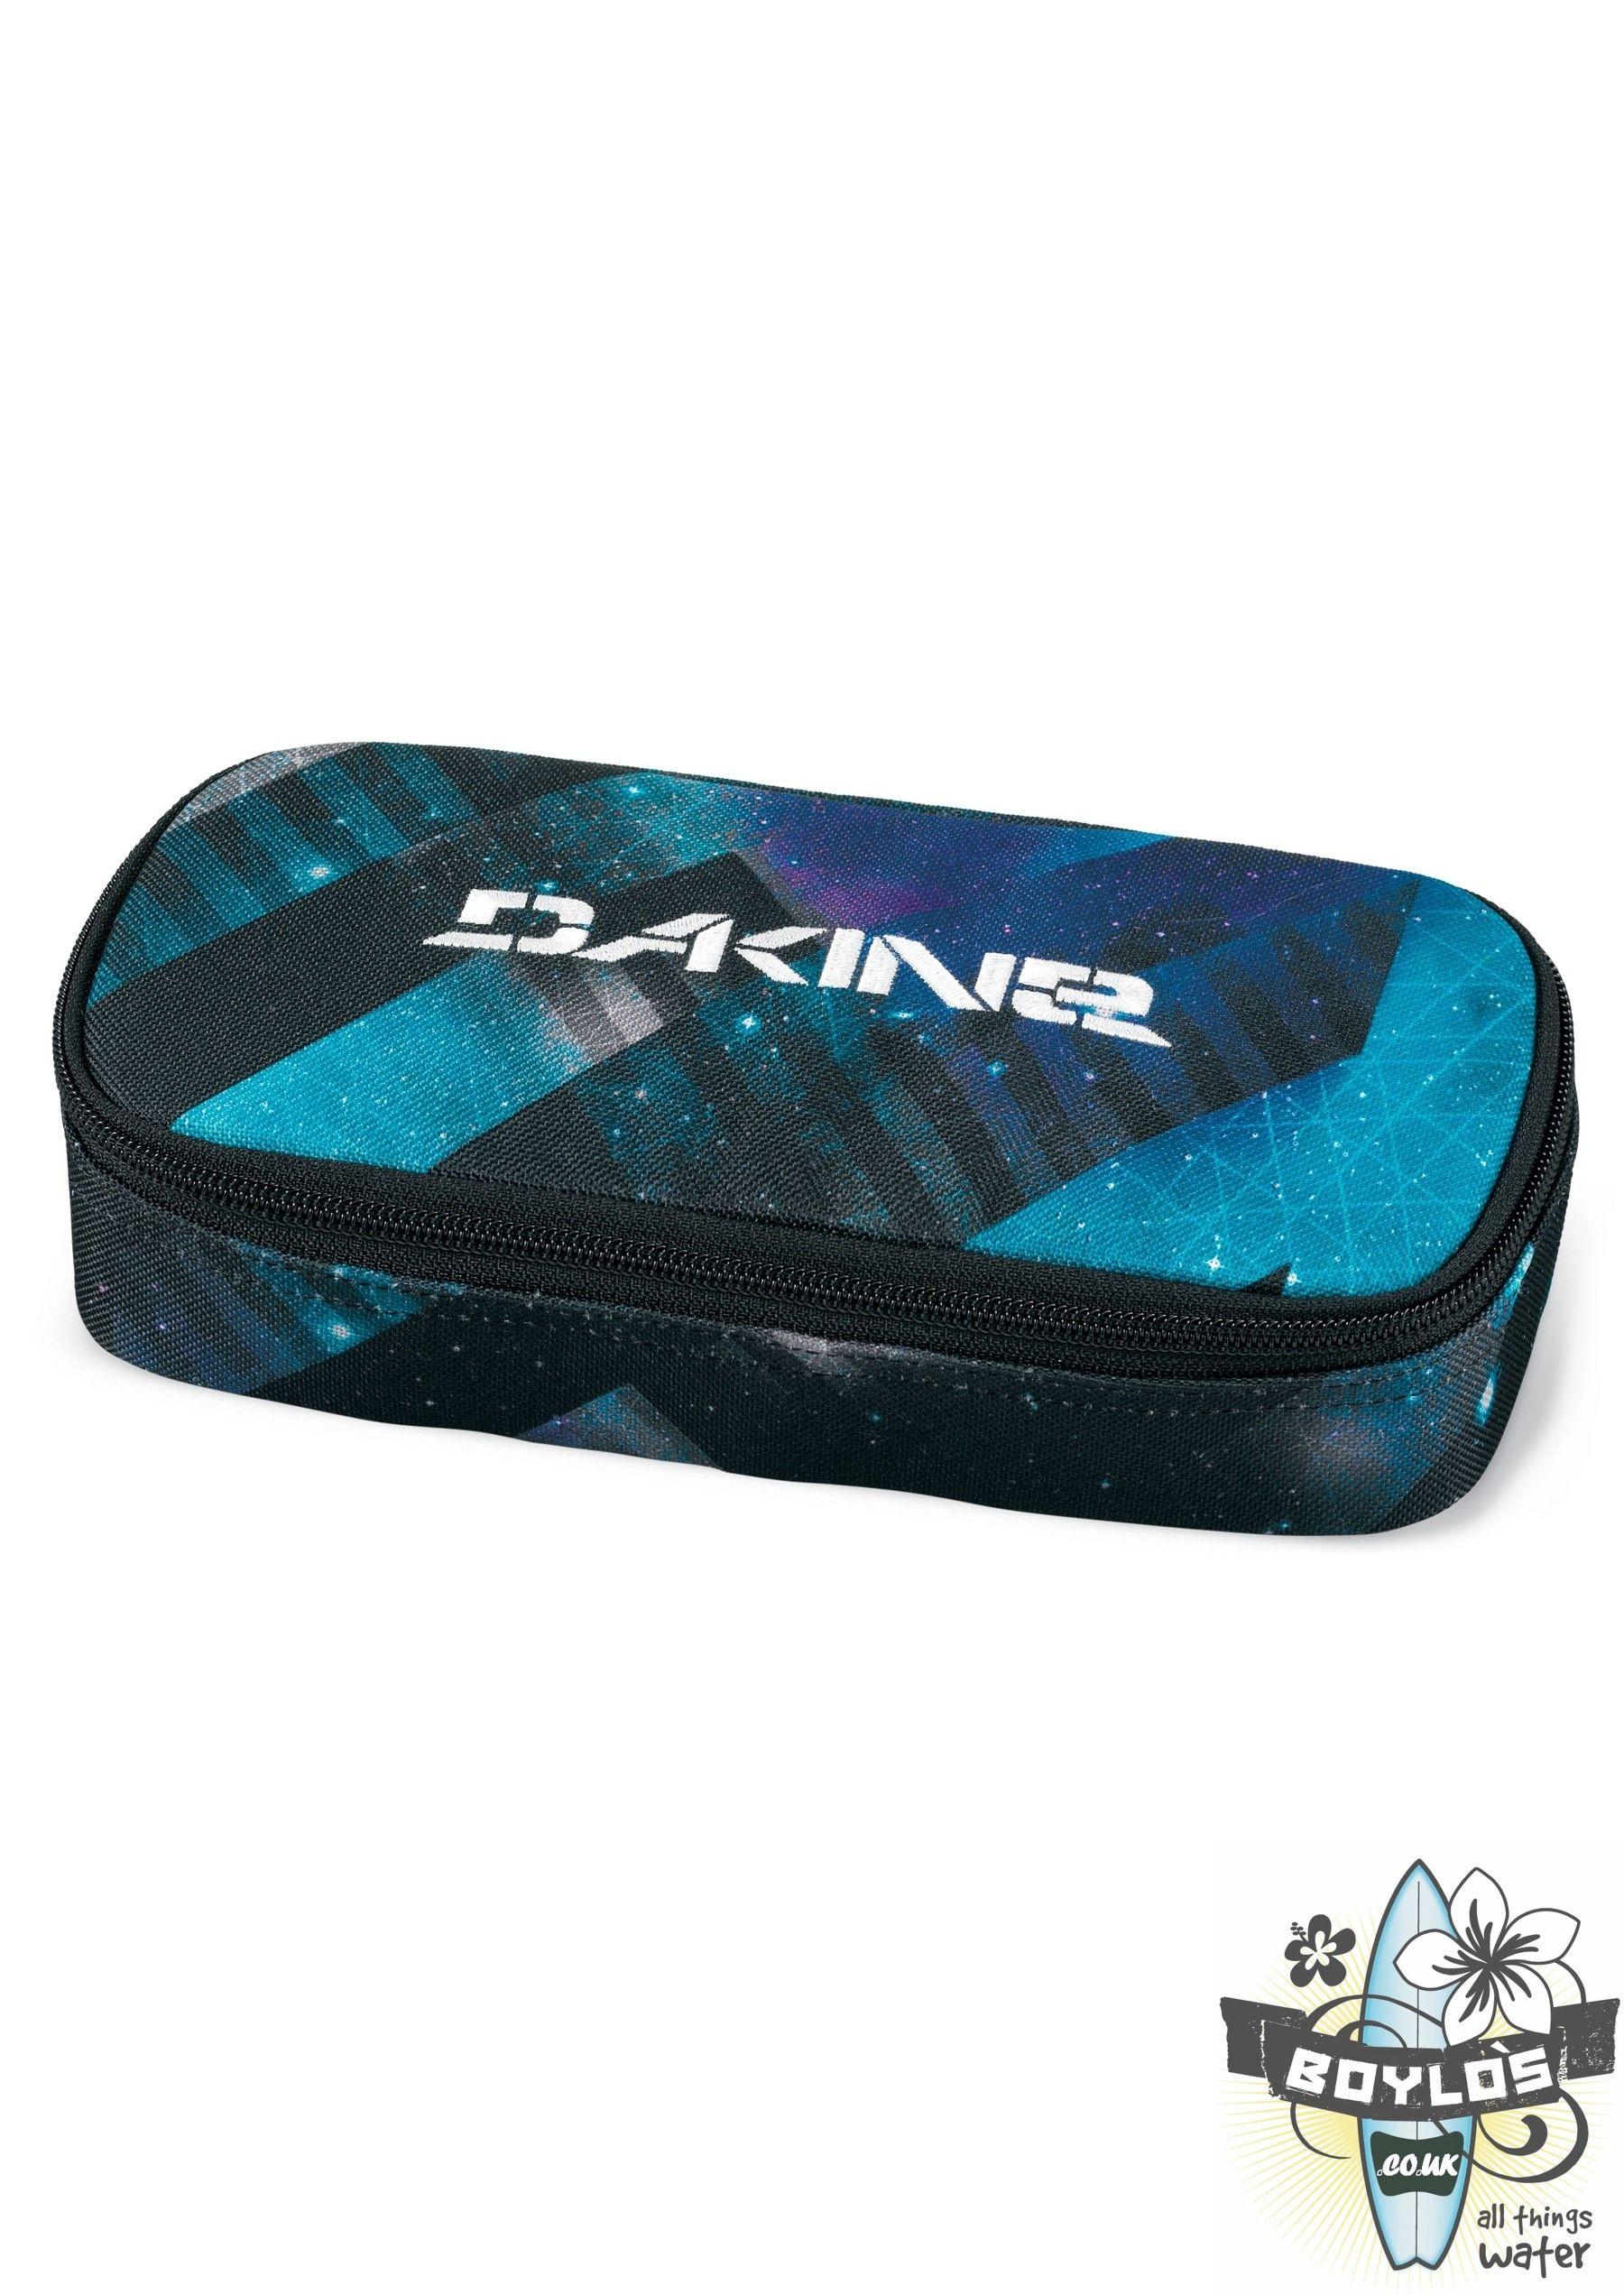 Boylos.co.uk - Dakine School Case - Nebula http://www.boylos.co.uk/products/view/dakine-school-case---nebula